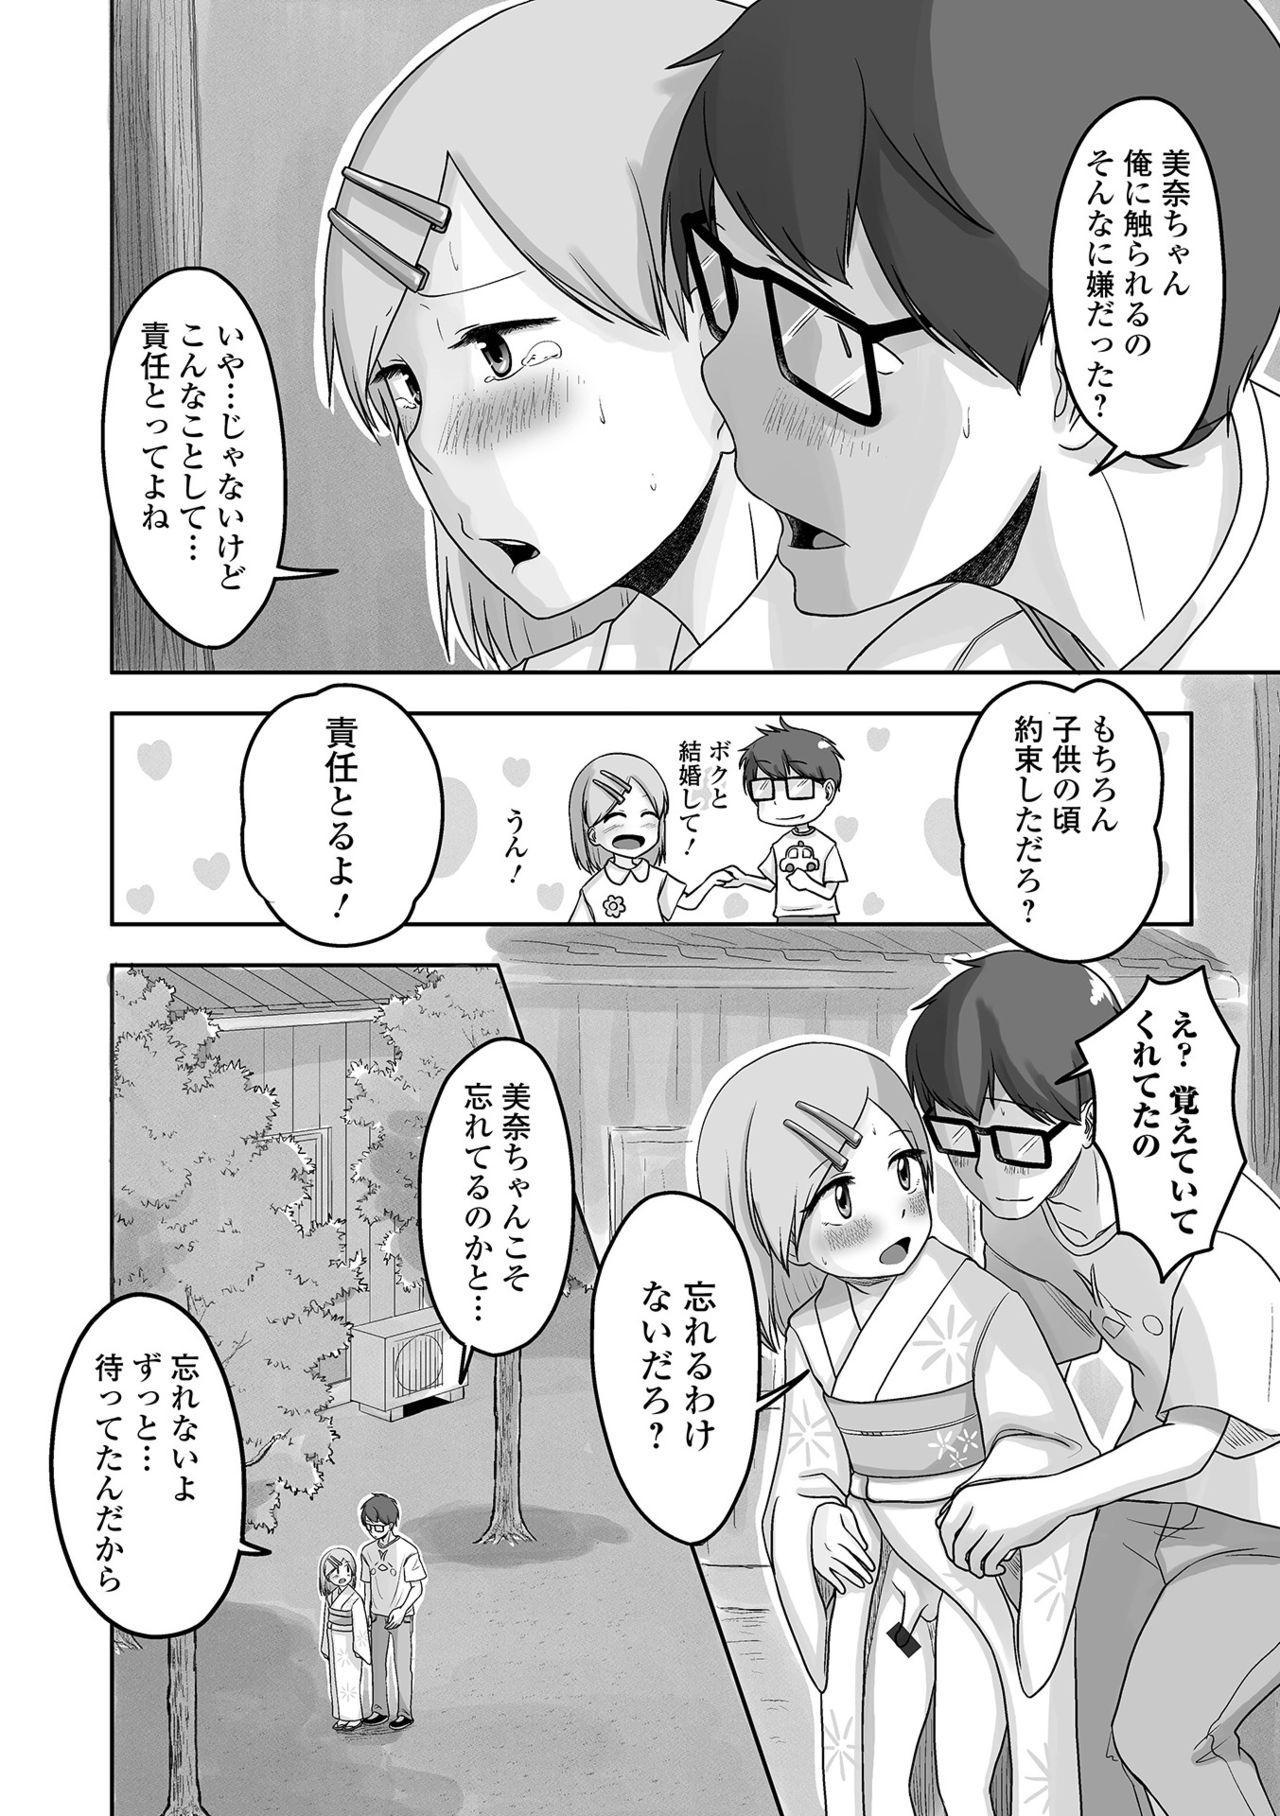 Gekkan Web Otoko no Ko-llection! S Vol. 64 73